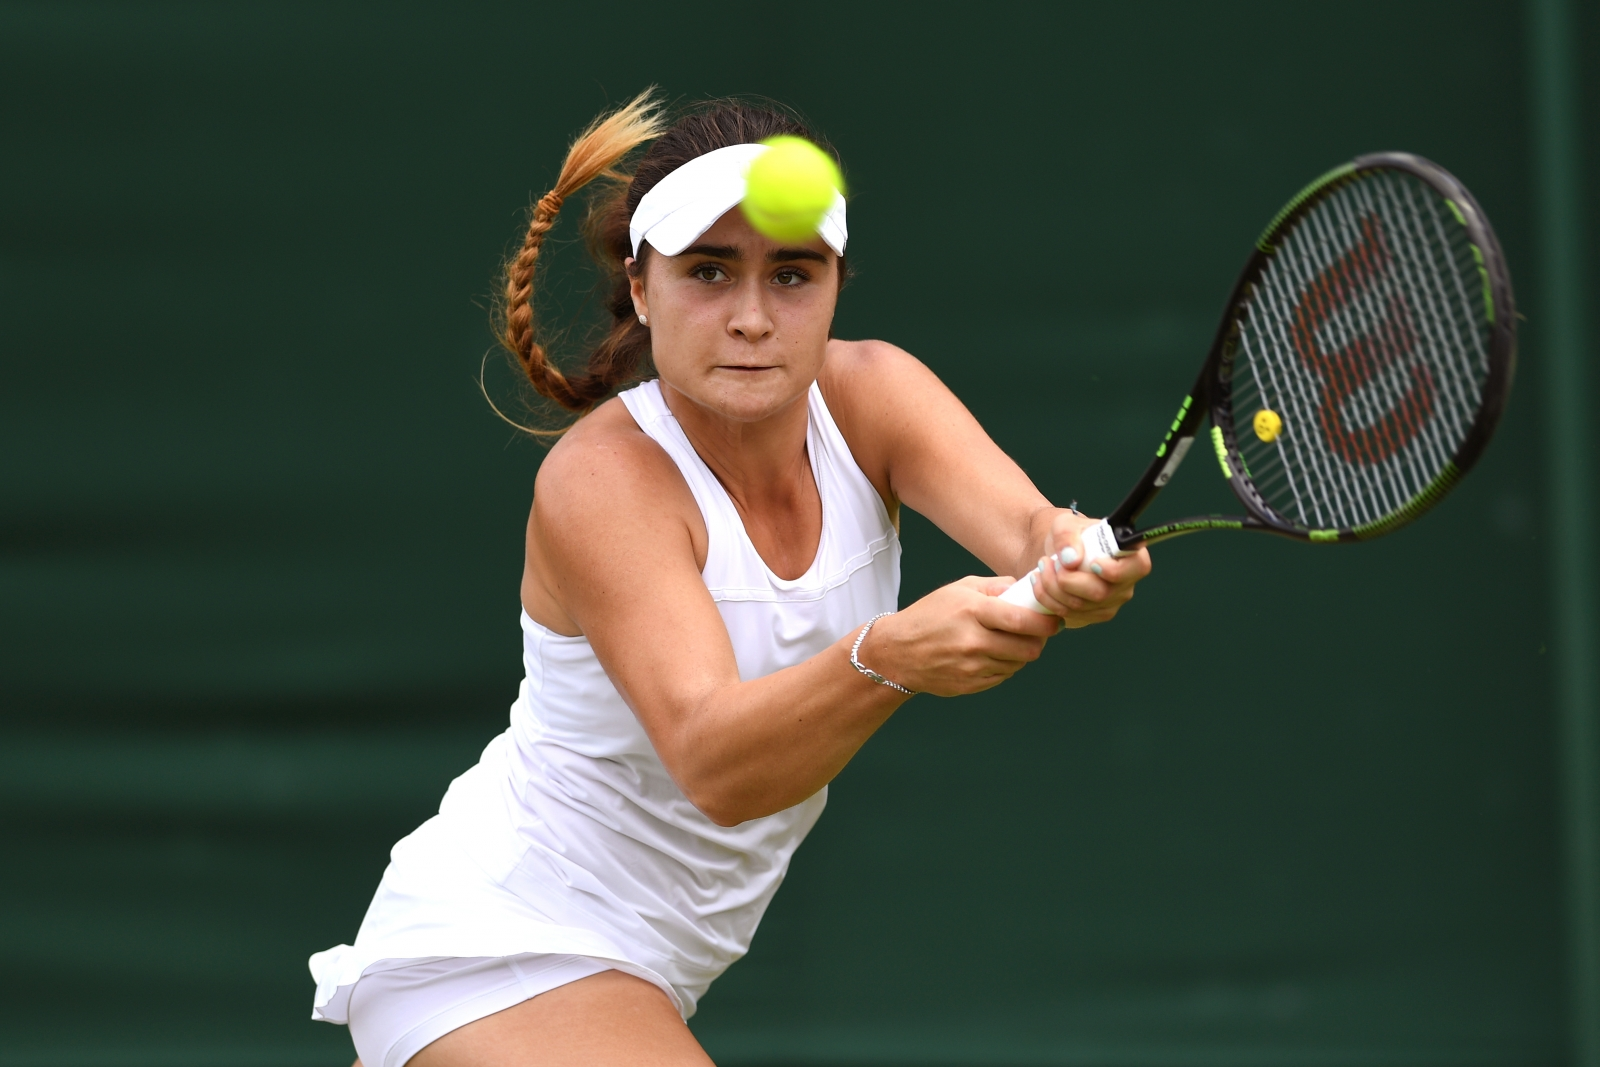 Gabriella Taylor tennis player poison plot